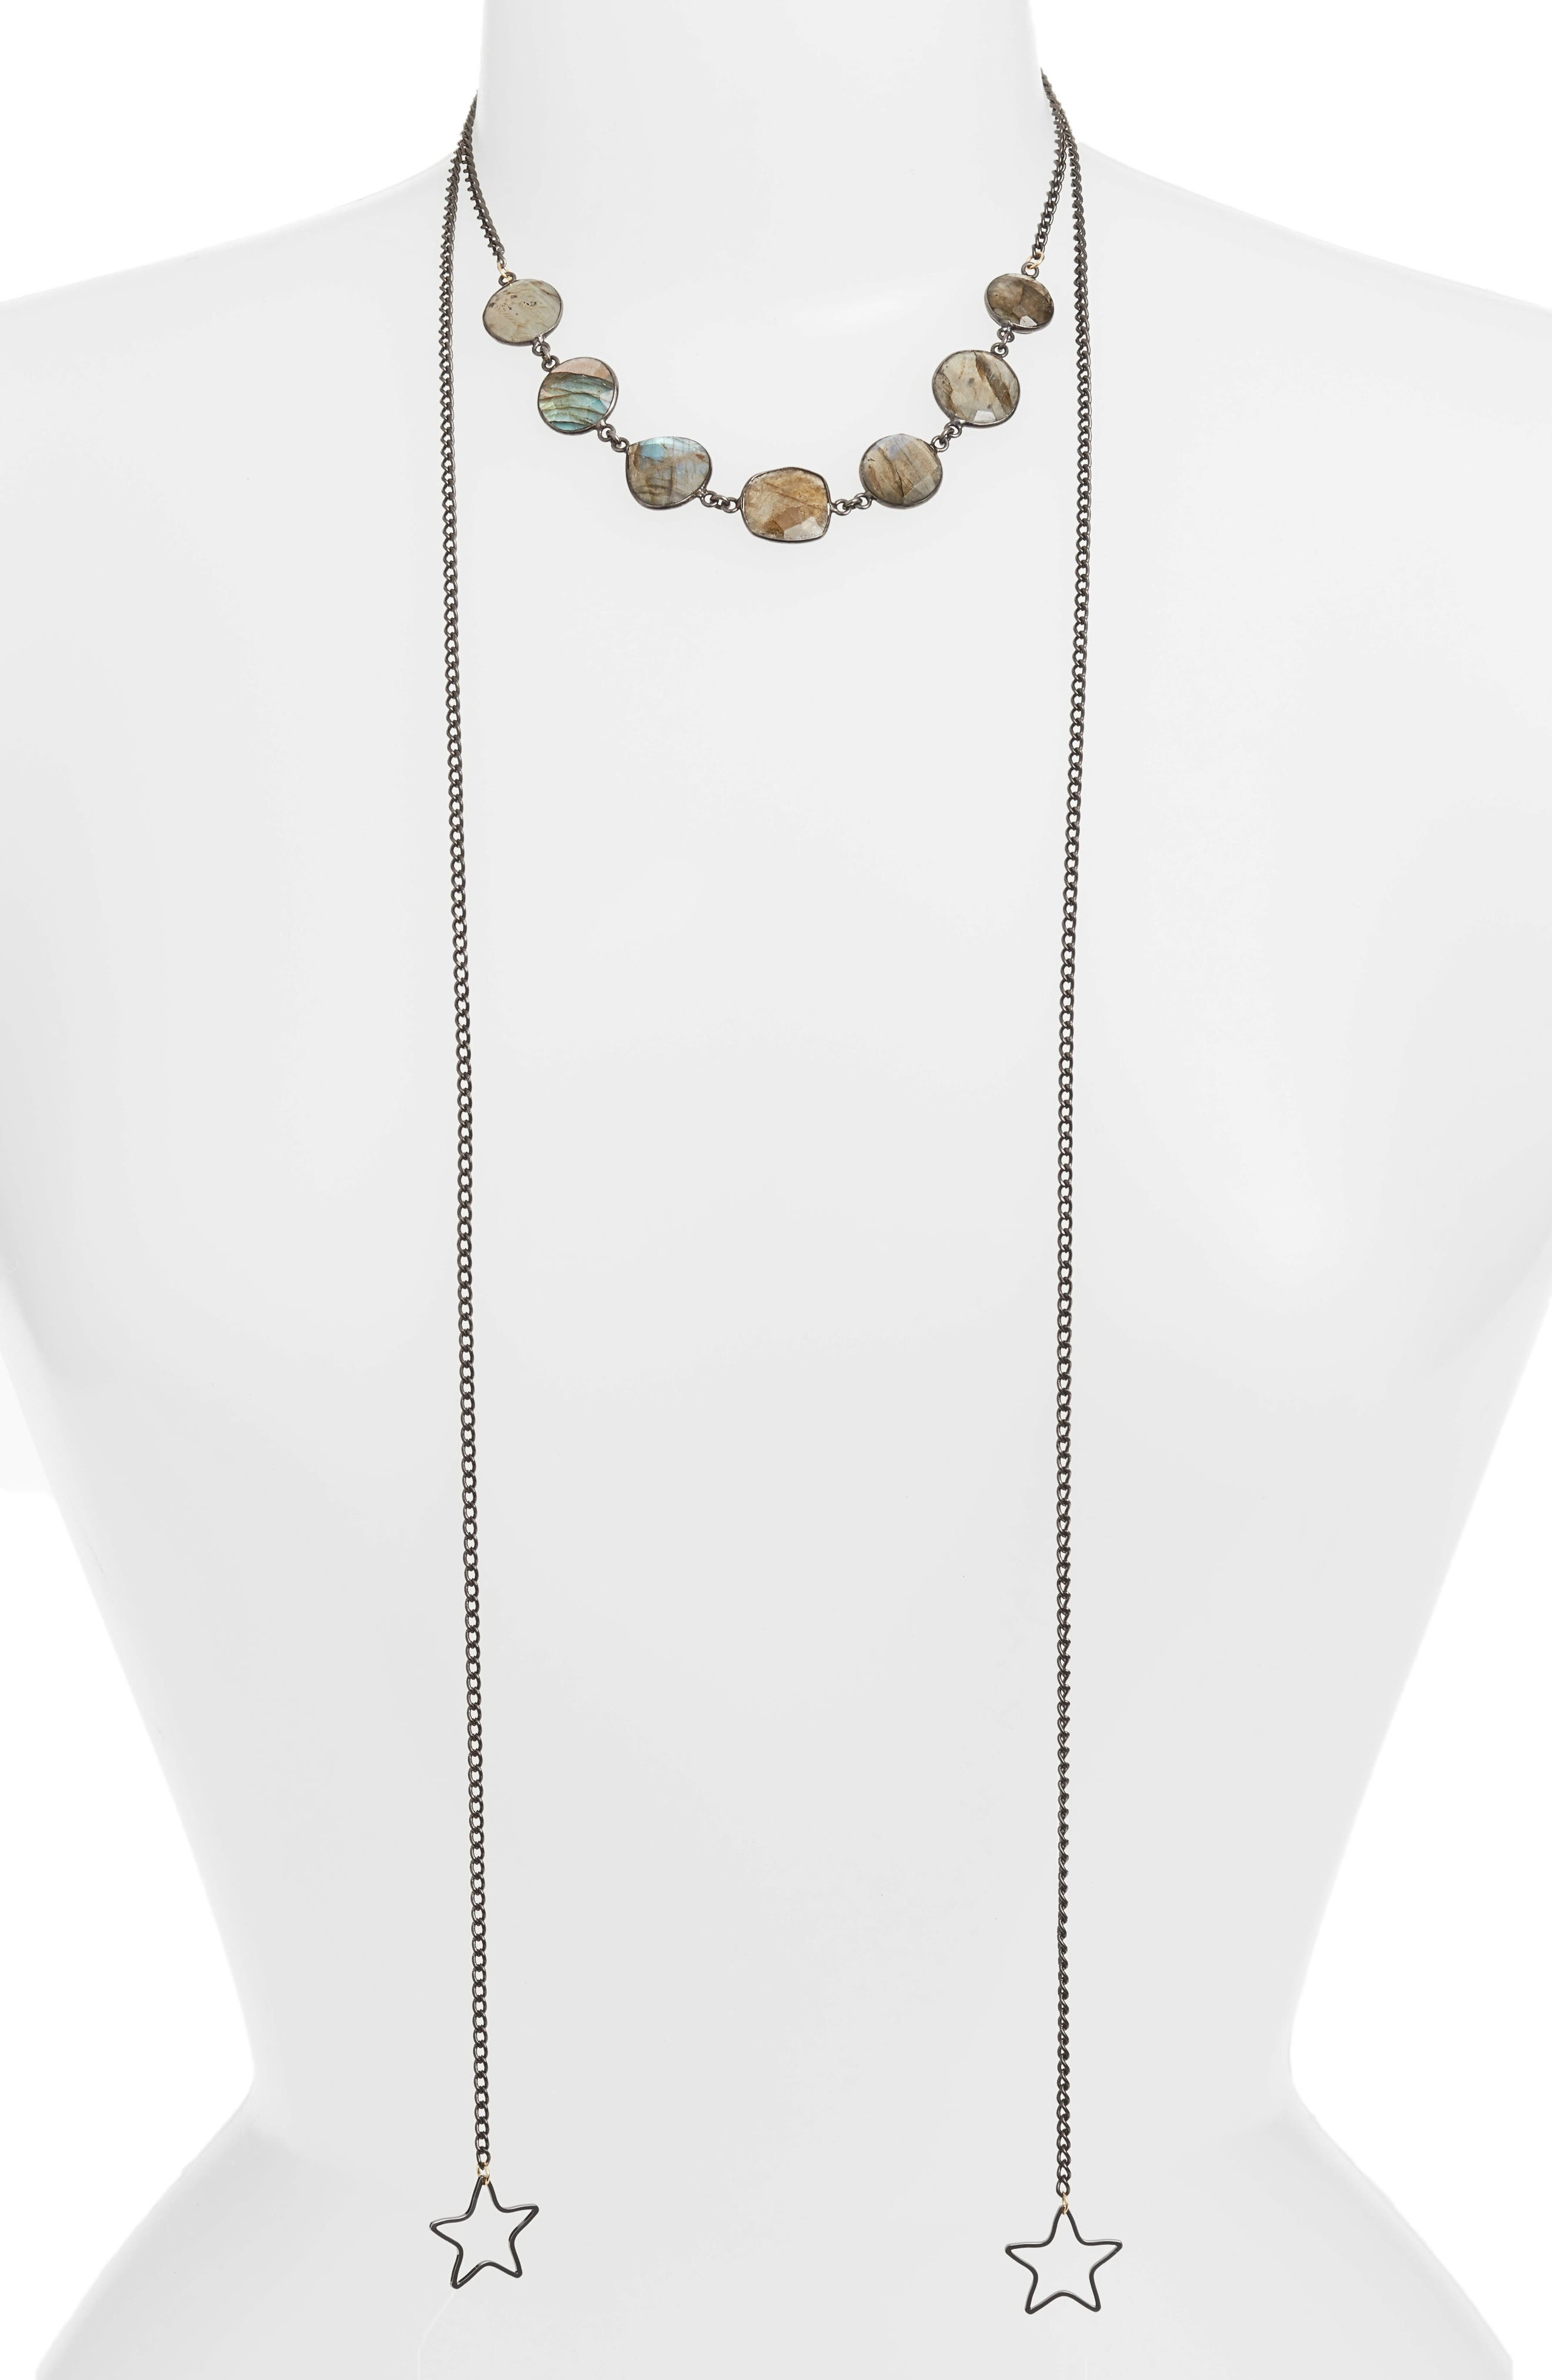 Stargirl Labradorite Lariat Necklace,                             Main thumbnail 1, color,                             GUNMETAL/ GREY